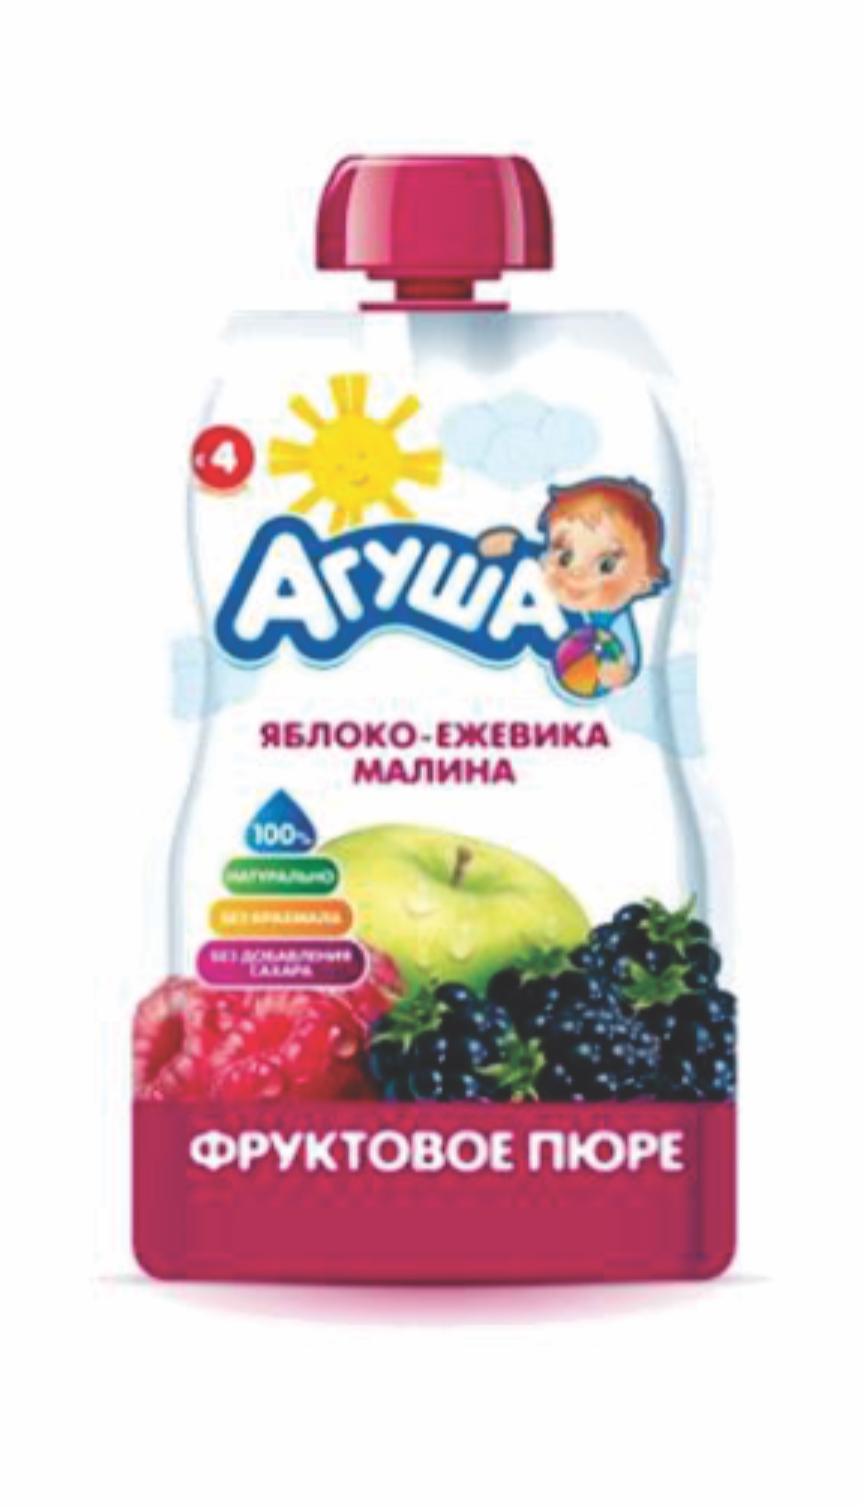 АГУША - ПЮРЕ ЯБЛОКО/ЕЖЕВИКА/МАЛИНА ПАУЧ 90гр 4690228032325